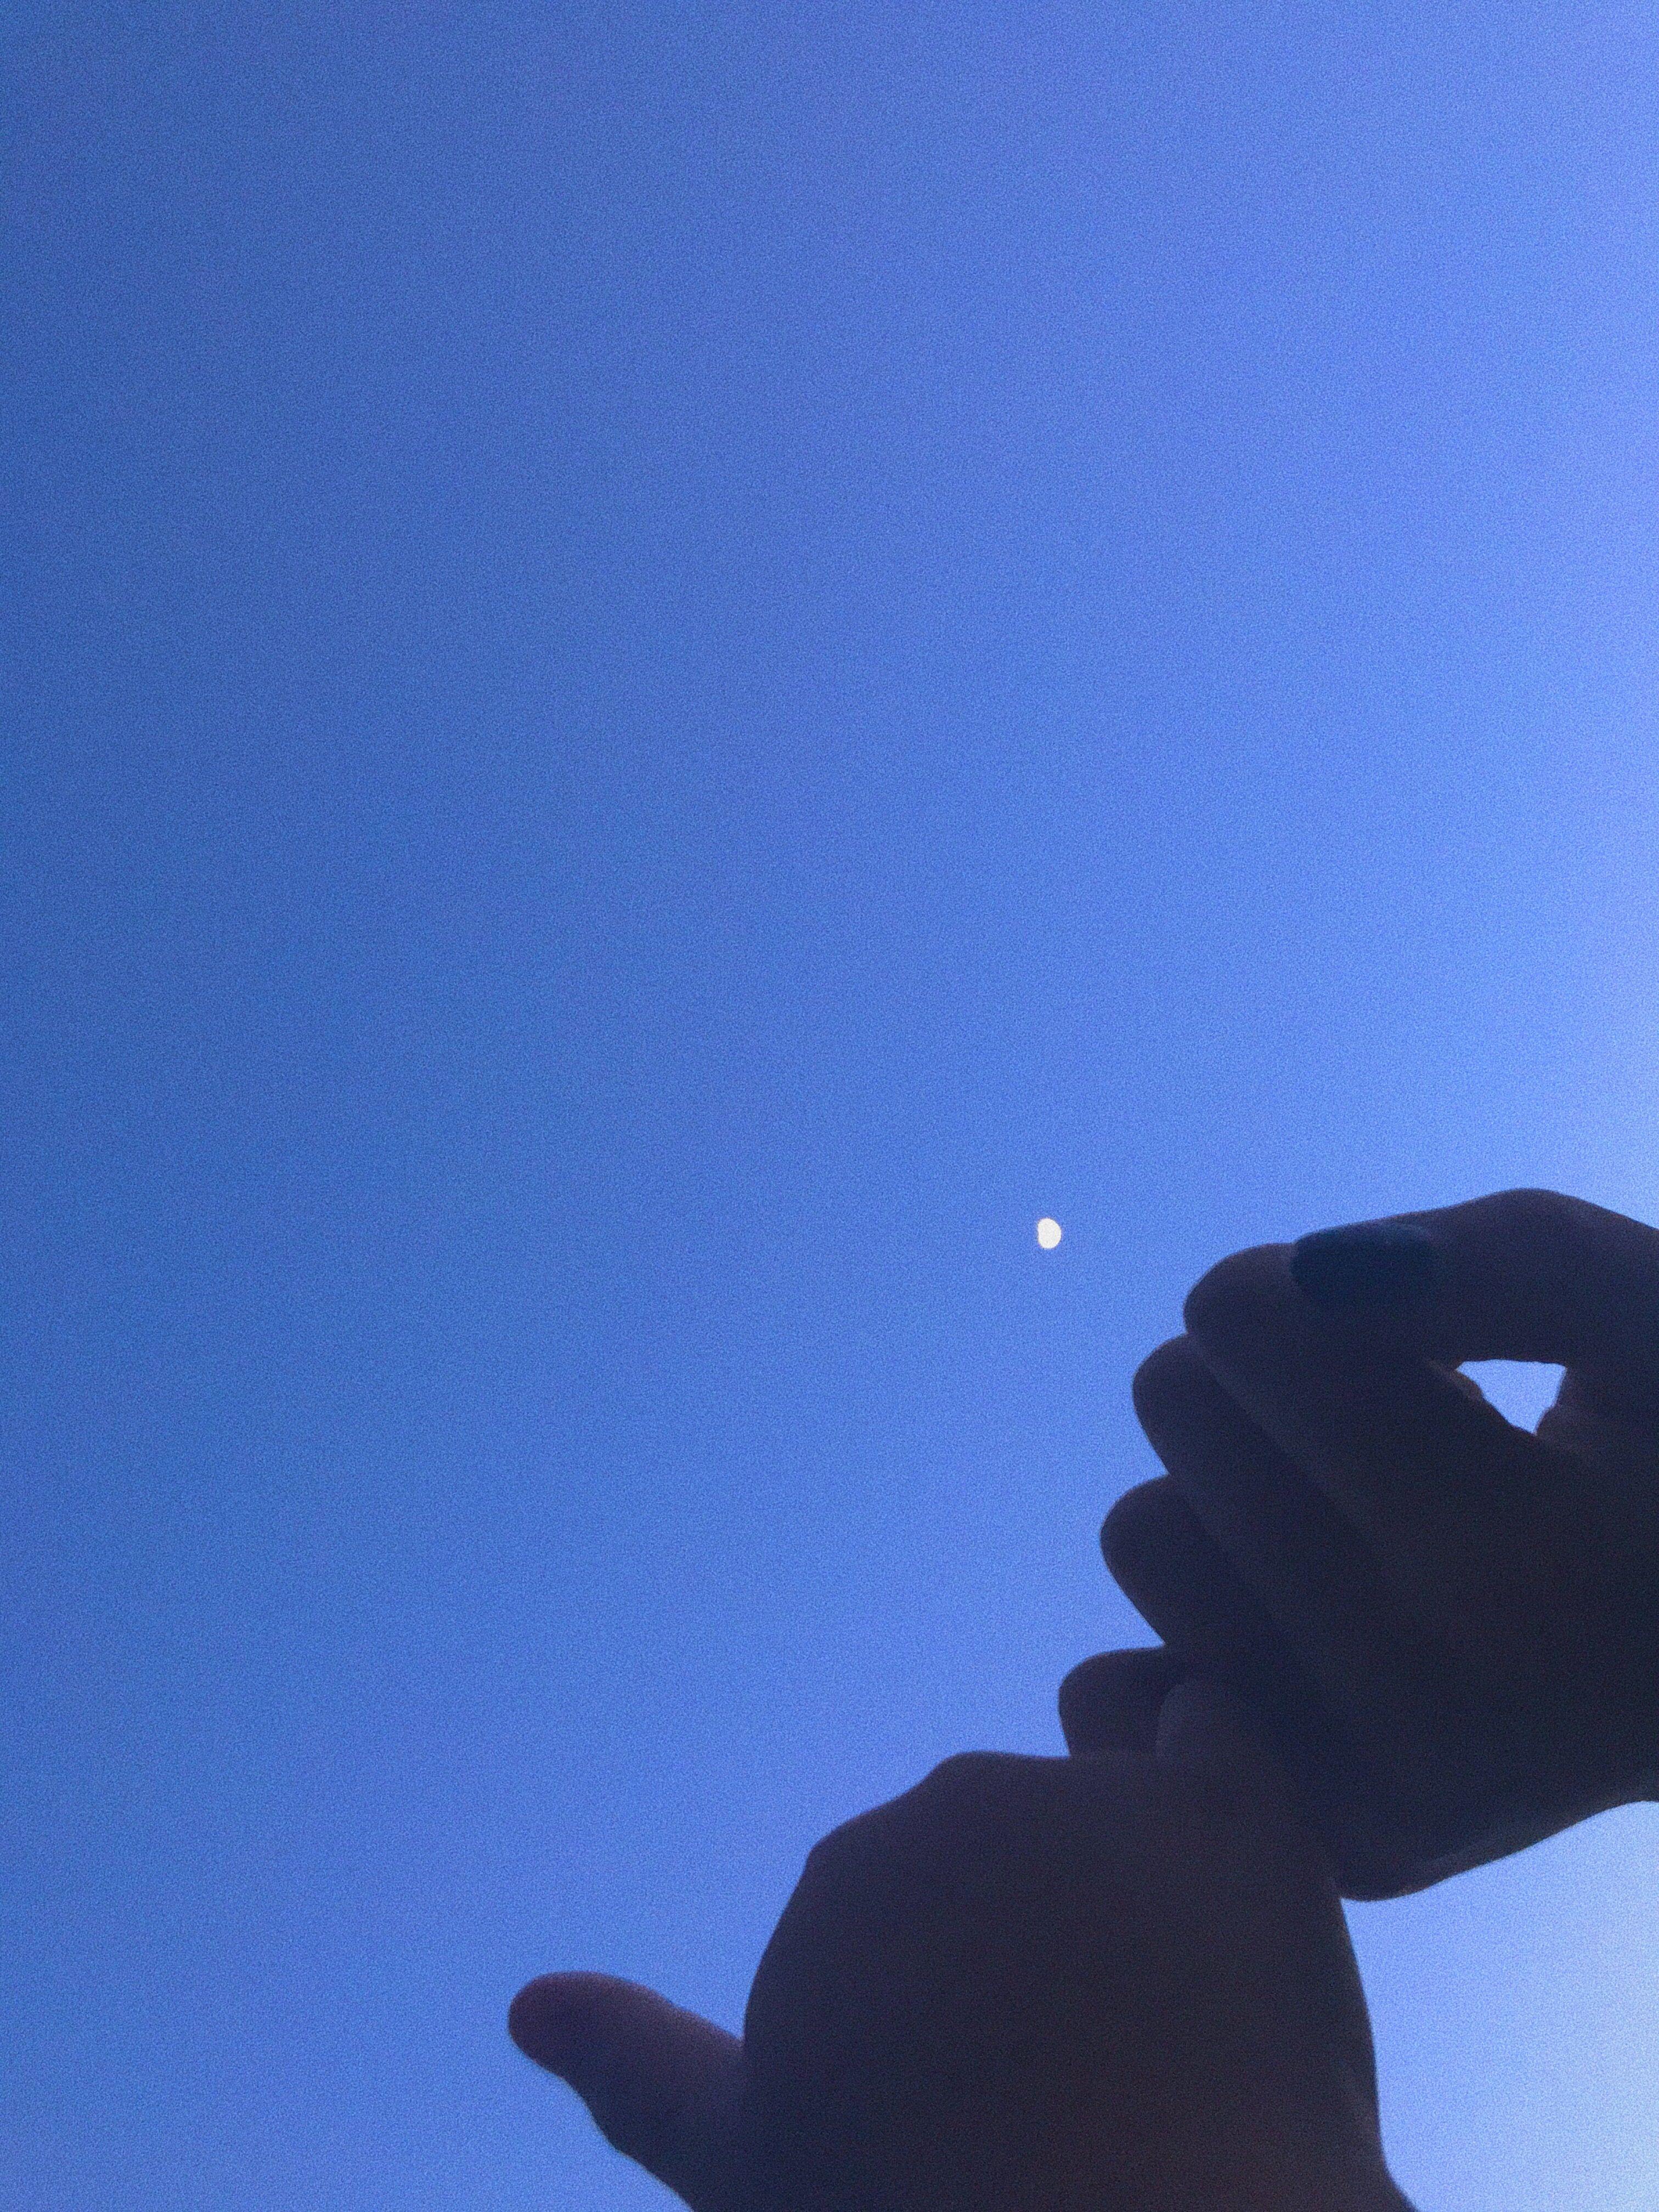 Holding Hands Night Aesthetic Sky Aesthetic Couple Aesthetic